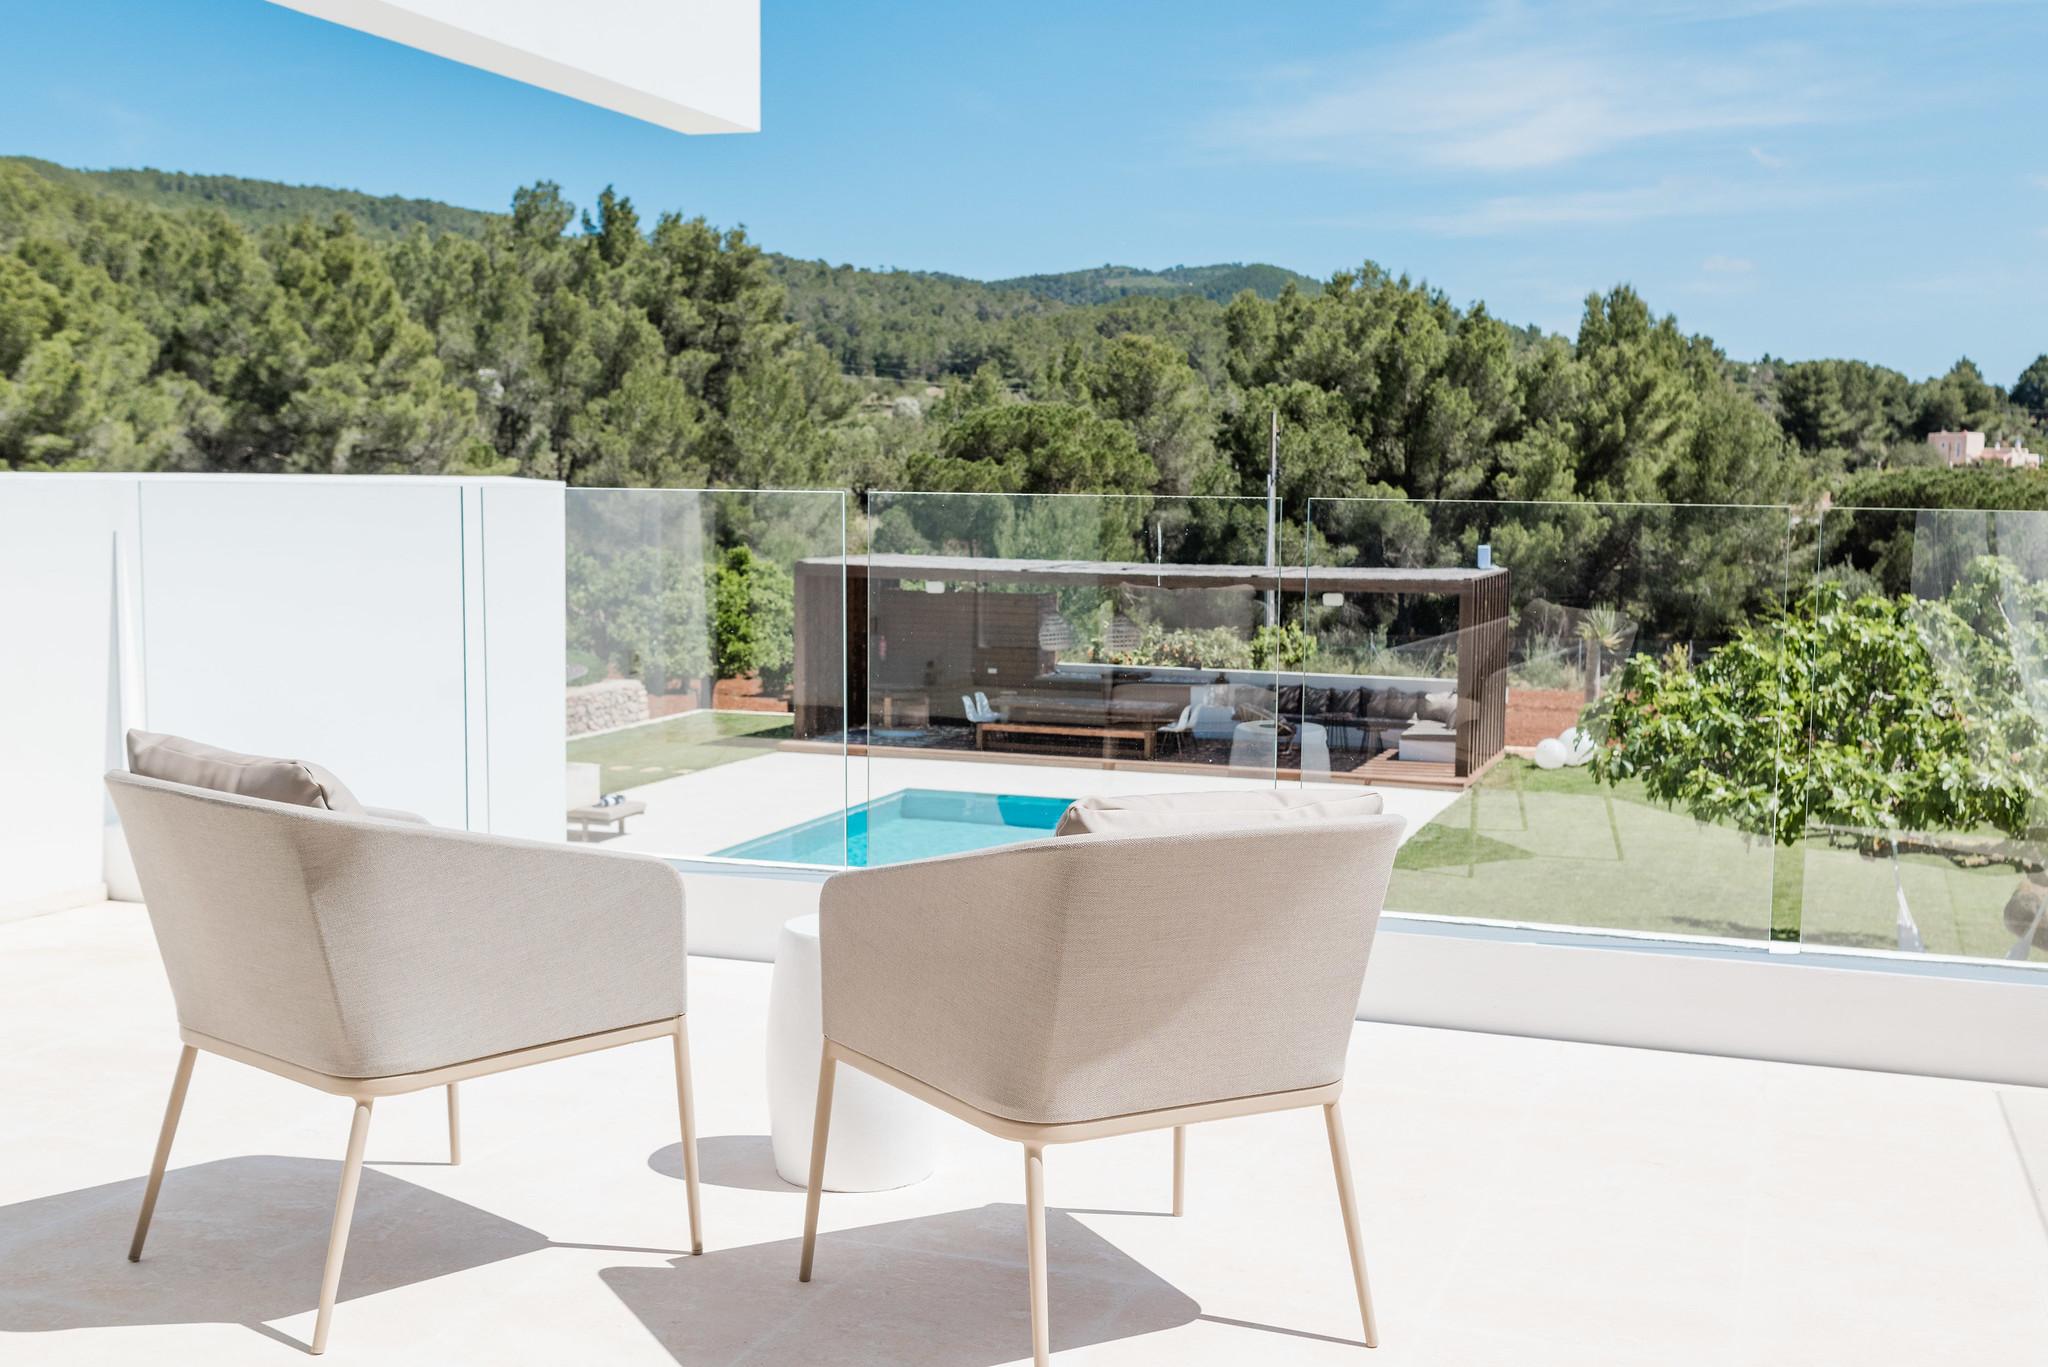 https://www.white-ibiza.com/wp-content/uploads/2020/06/white-ibiza-villas-can-carmen-exterior-terrace.jpg